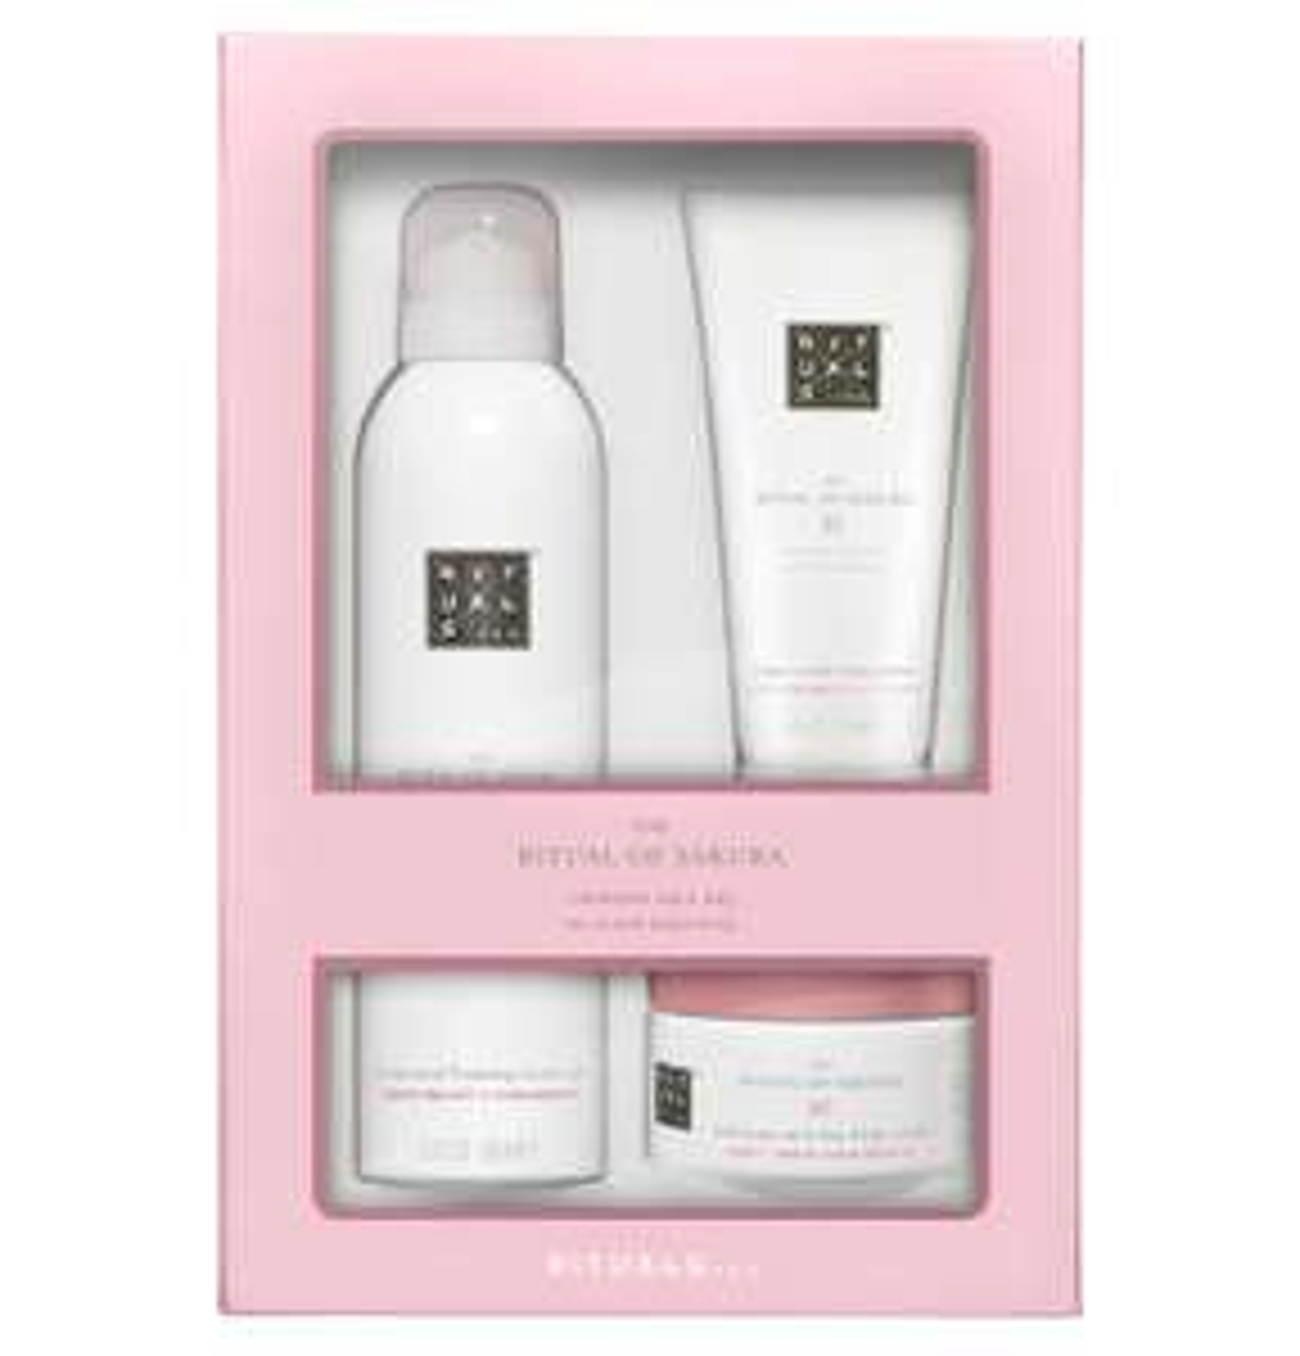 20% Rabatt auf alle Beauty-Artikel bei Galeria Kaufhof, z.B. RITUALS, Sakura, Pflege-Set 3-teilig